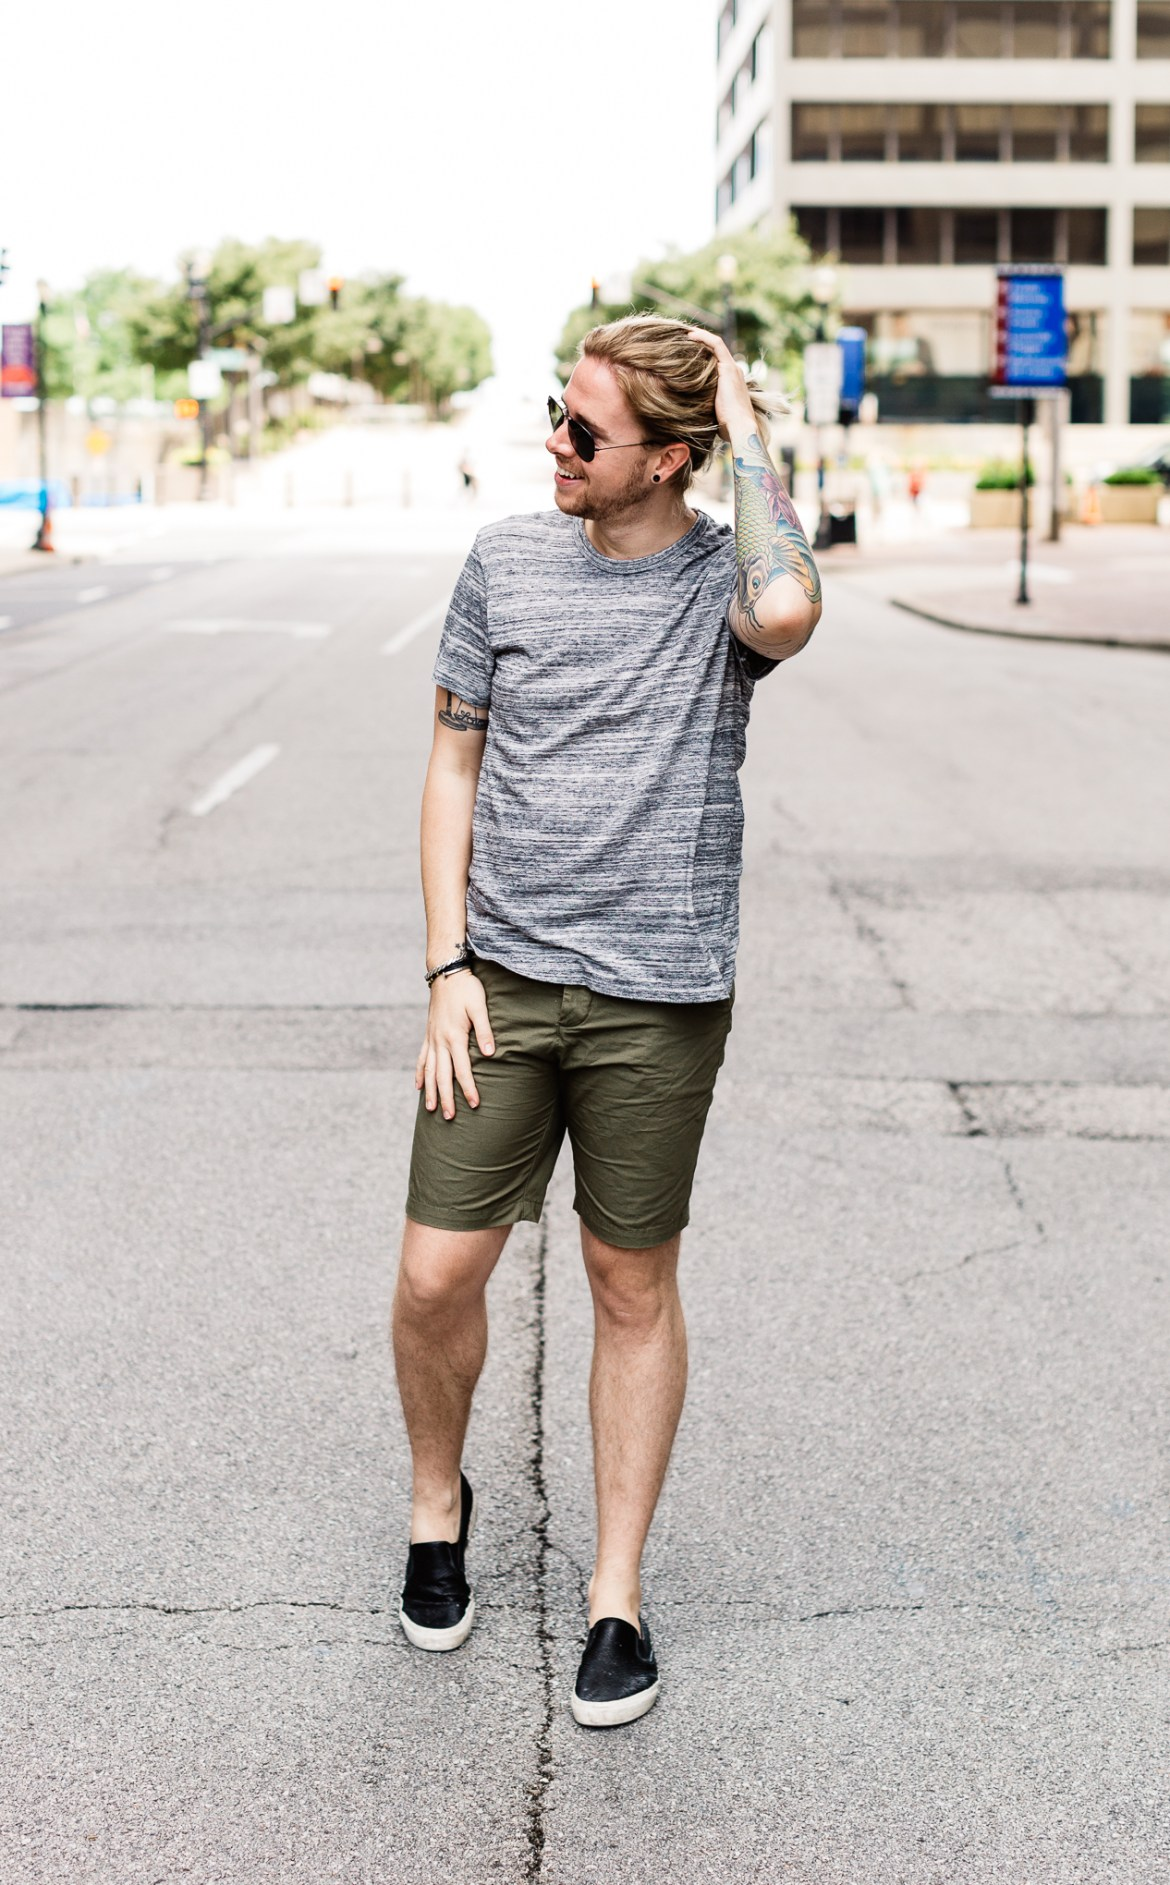 hm mens clothing, mens personal style blog, mens fashion blog, alternative apparel, olive shorts